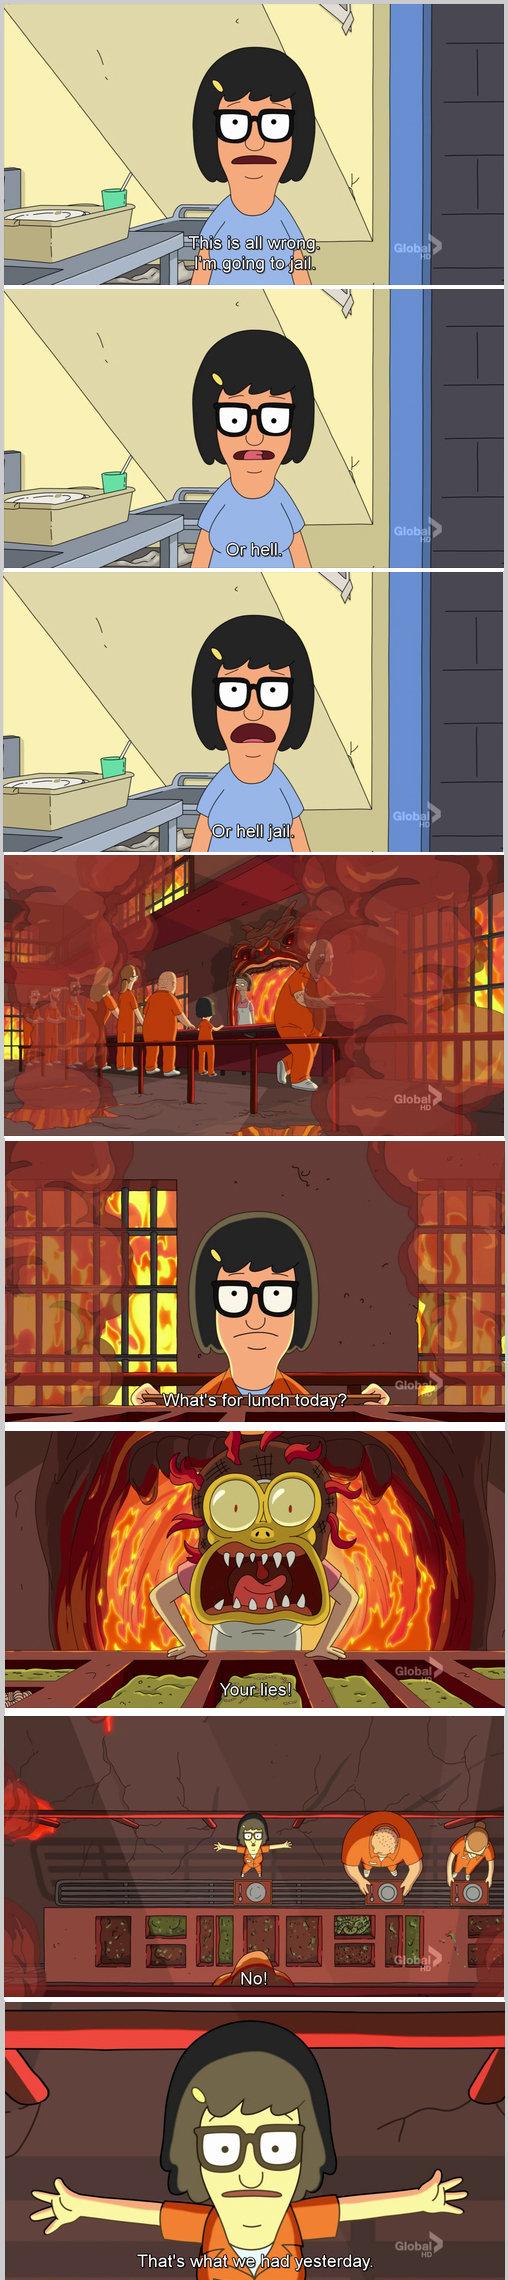 Hell Jail. Bob's Burgers caption... Pretty much my reaction to FJ frontpage. Hell Jail Bob's Burgers caption Pretty much my reaction to FJ frontpage